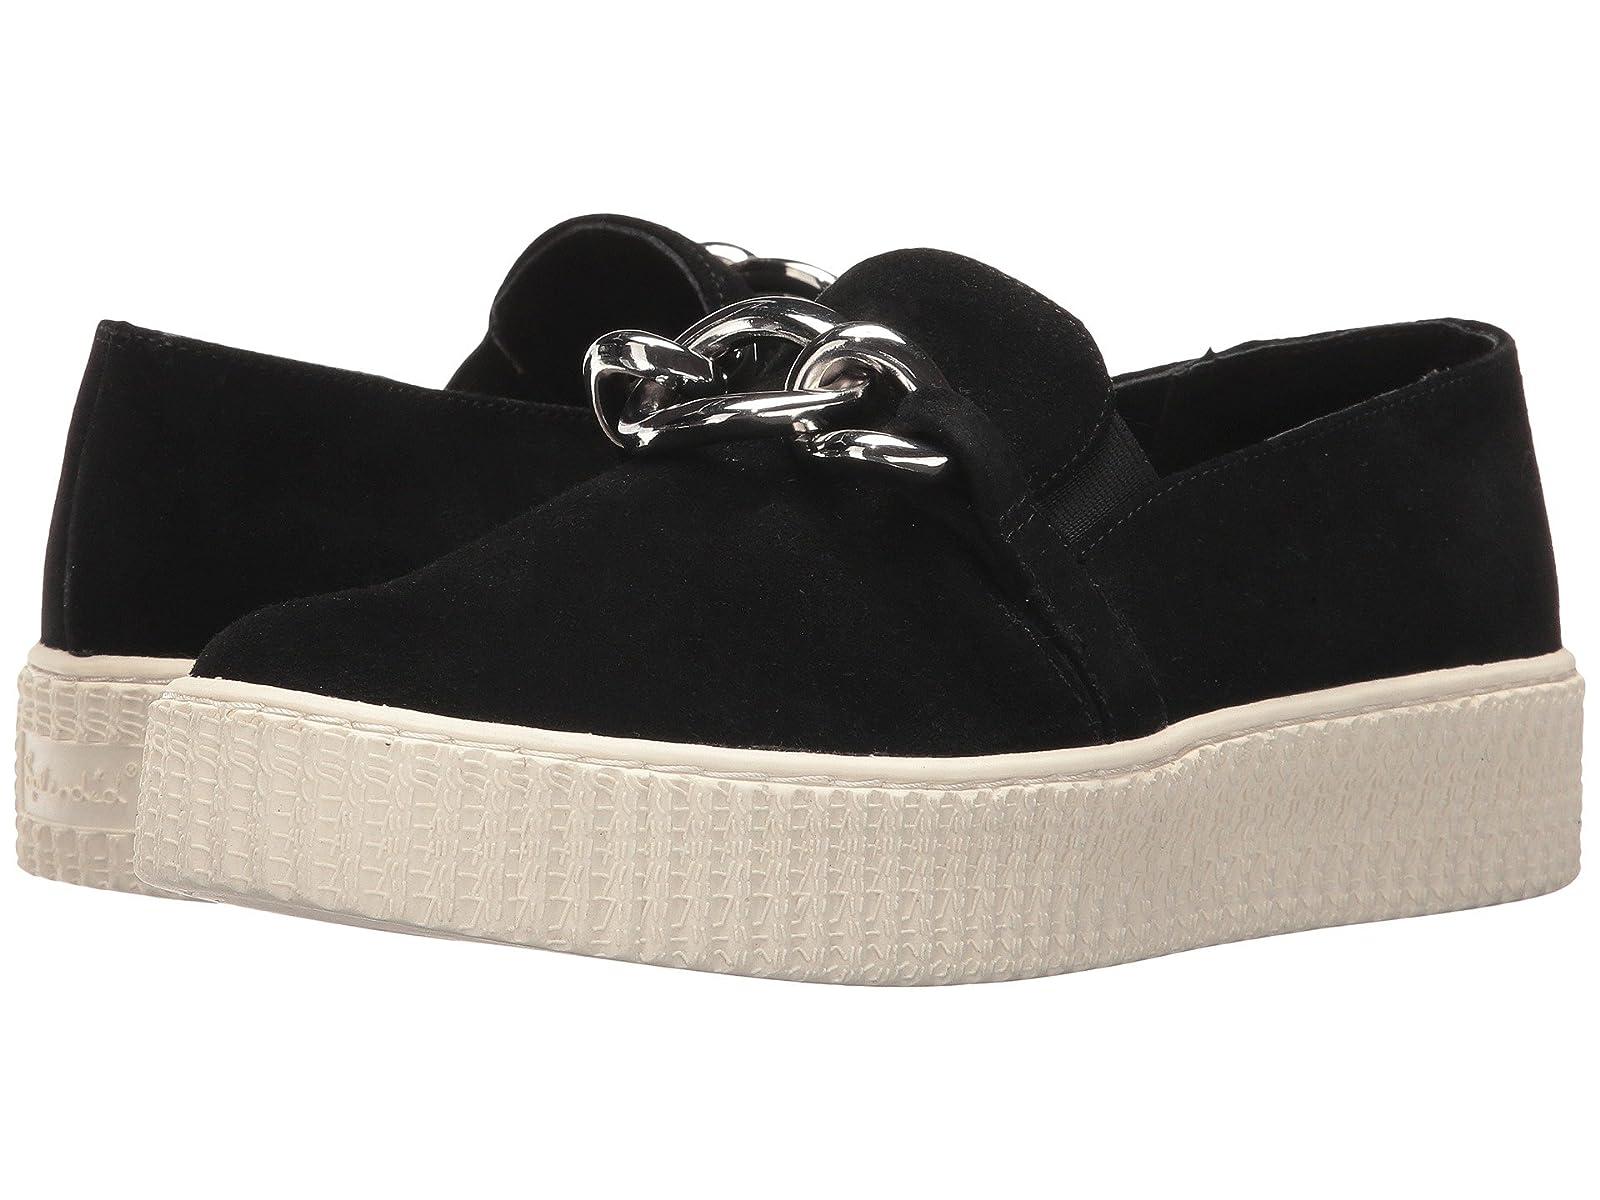 Splendid RobertaCheap and distinctive eye-catching shoes